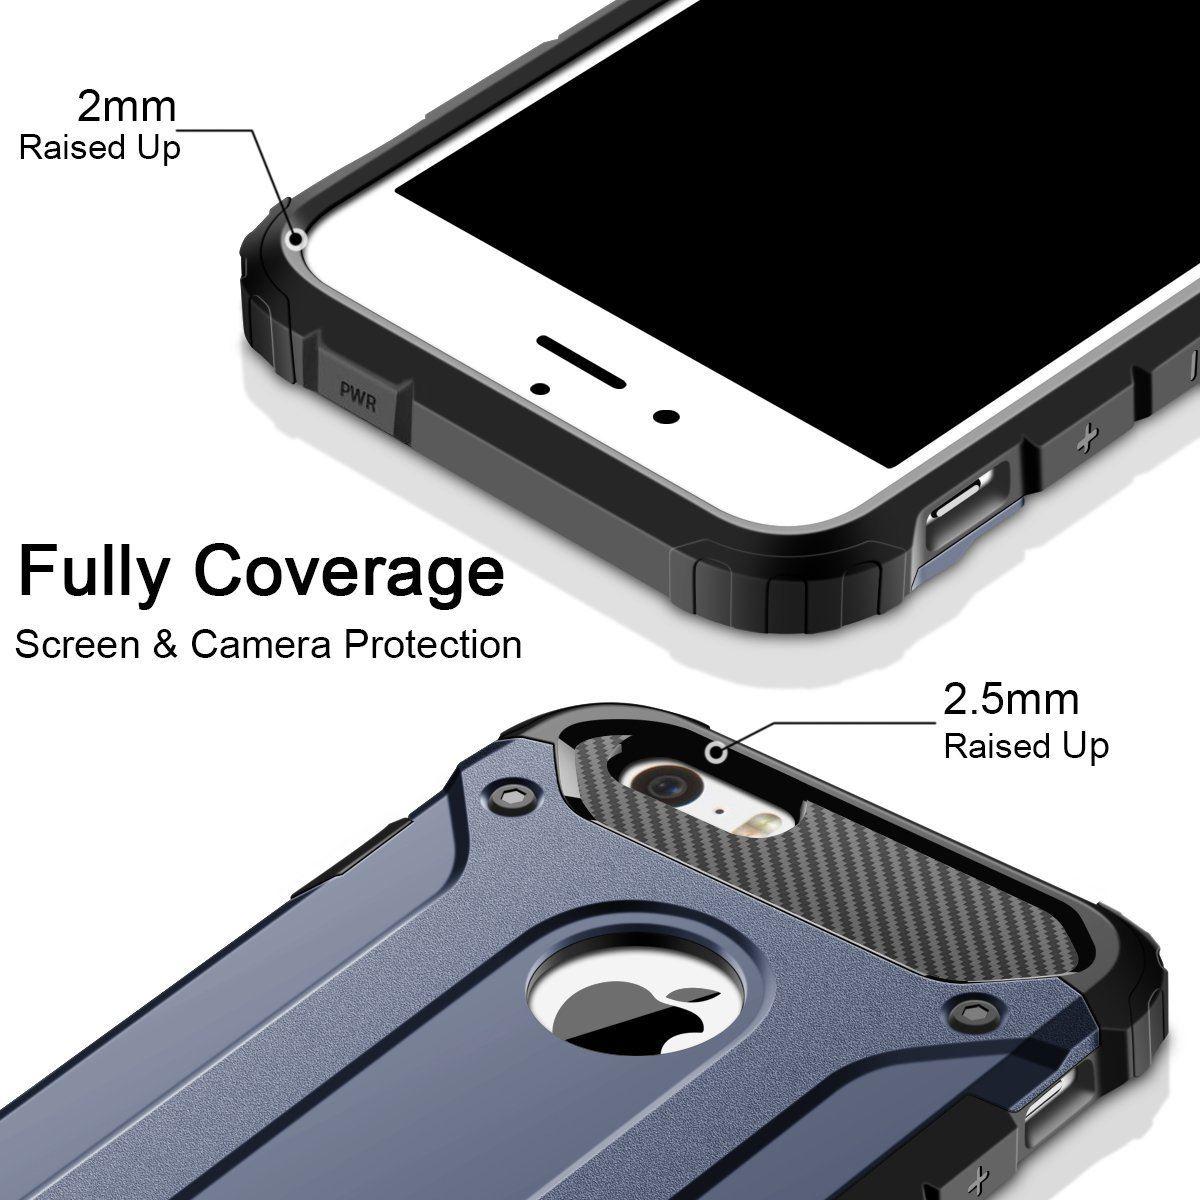 thumbnail 25 - For Apple iPhone 11 Pro Max XR Xs X 8 7 Plus 6 5 Se Case Cover Impact Heavy Duty